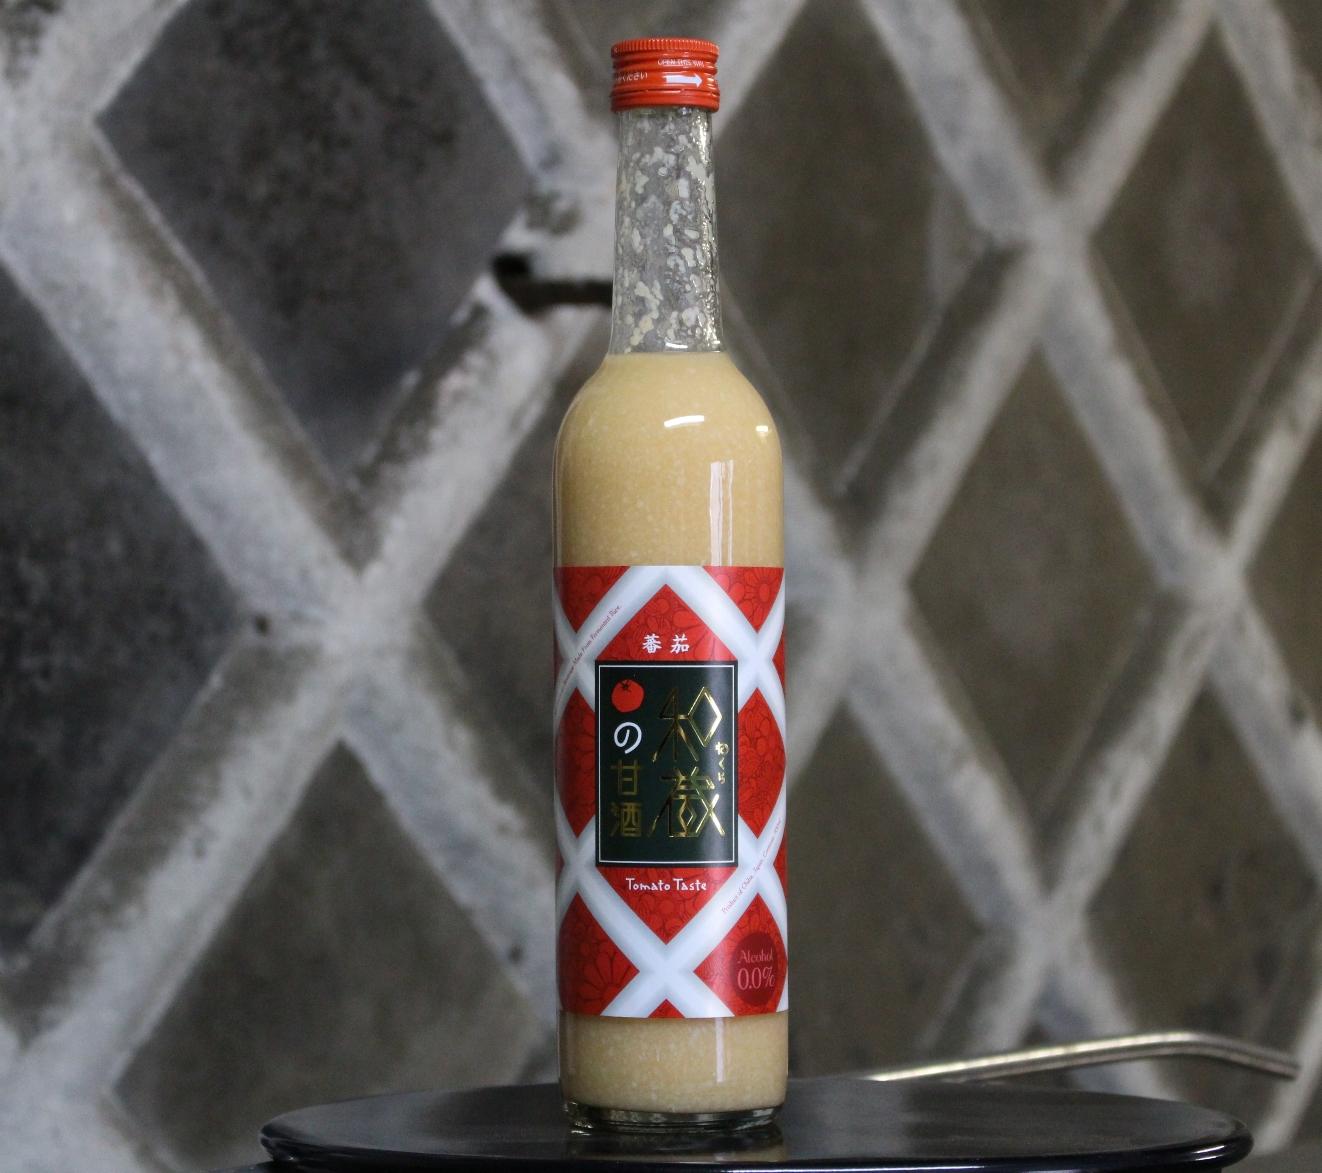 和蔵の甘酒蕃茄500ml